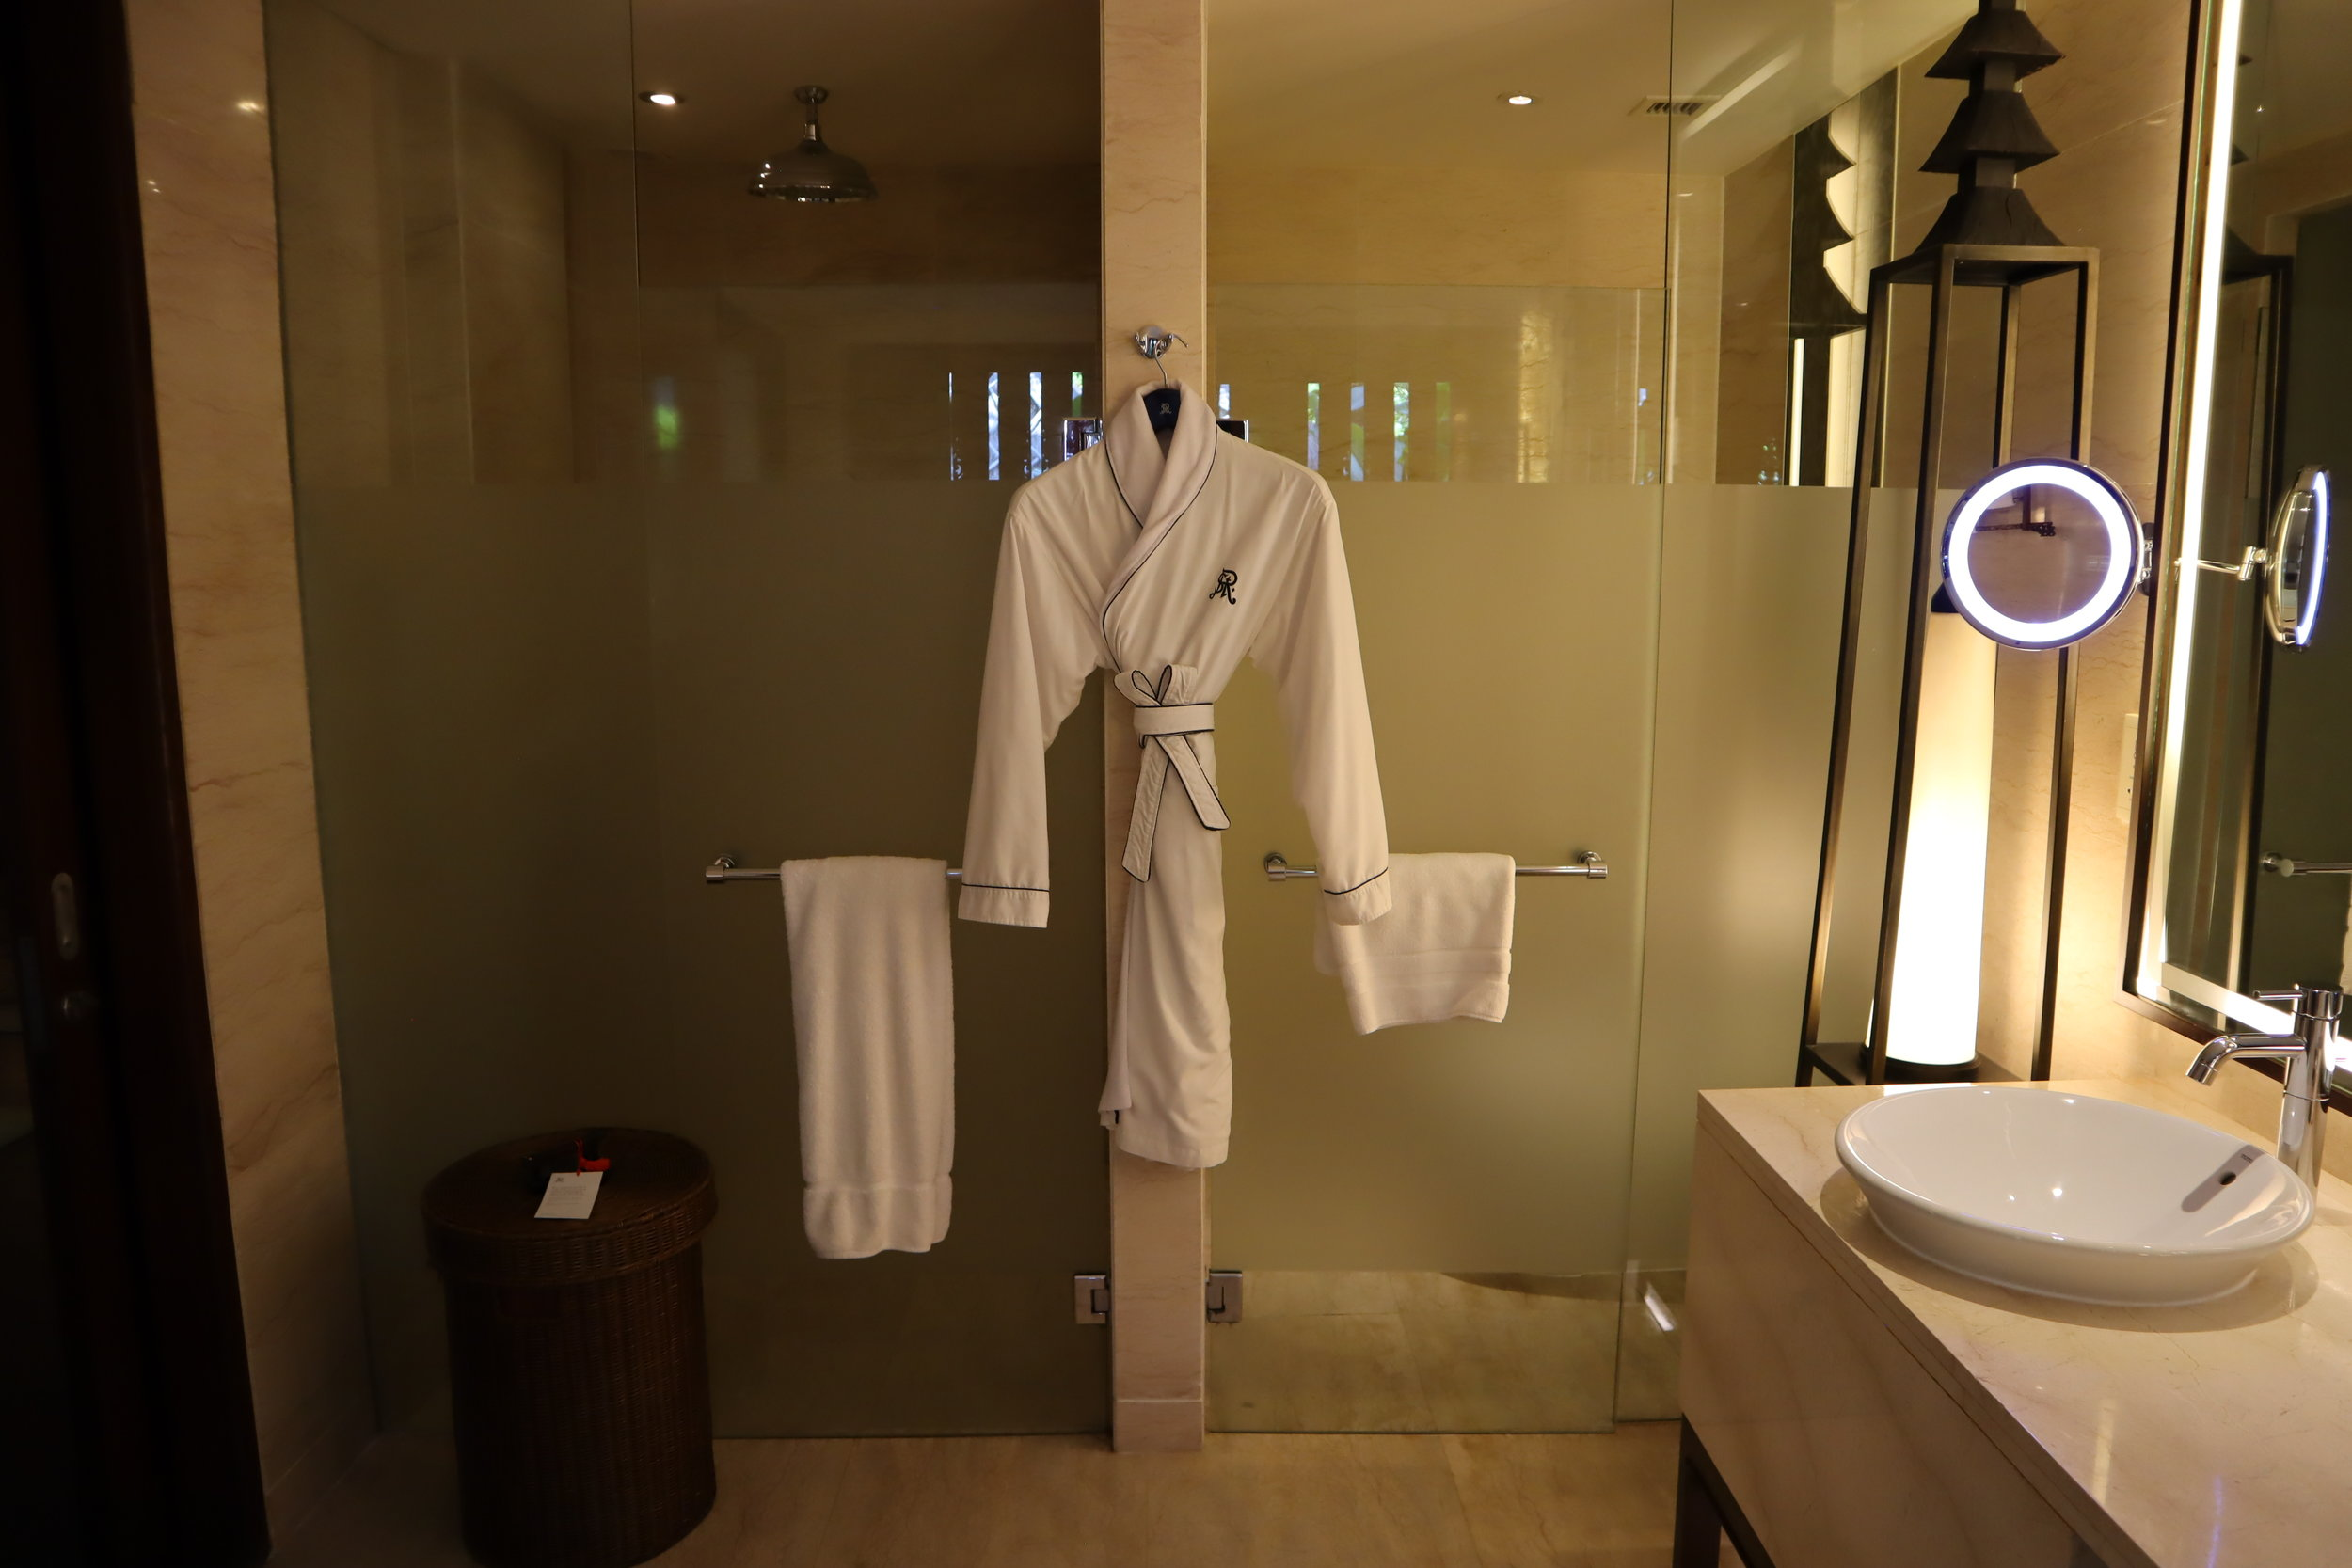 St. Regis Bali – St. Regis Pool Suite shower and toilet